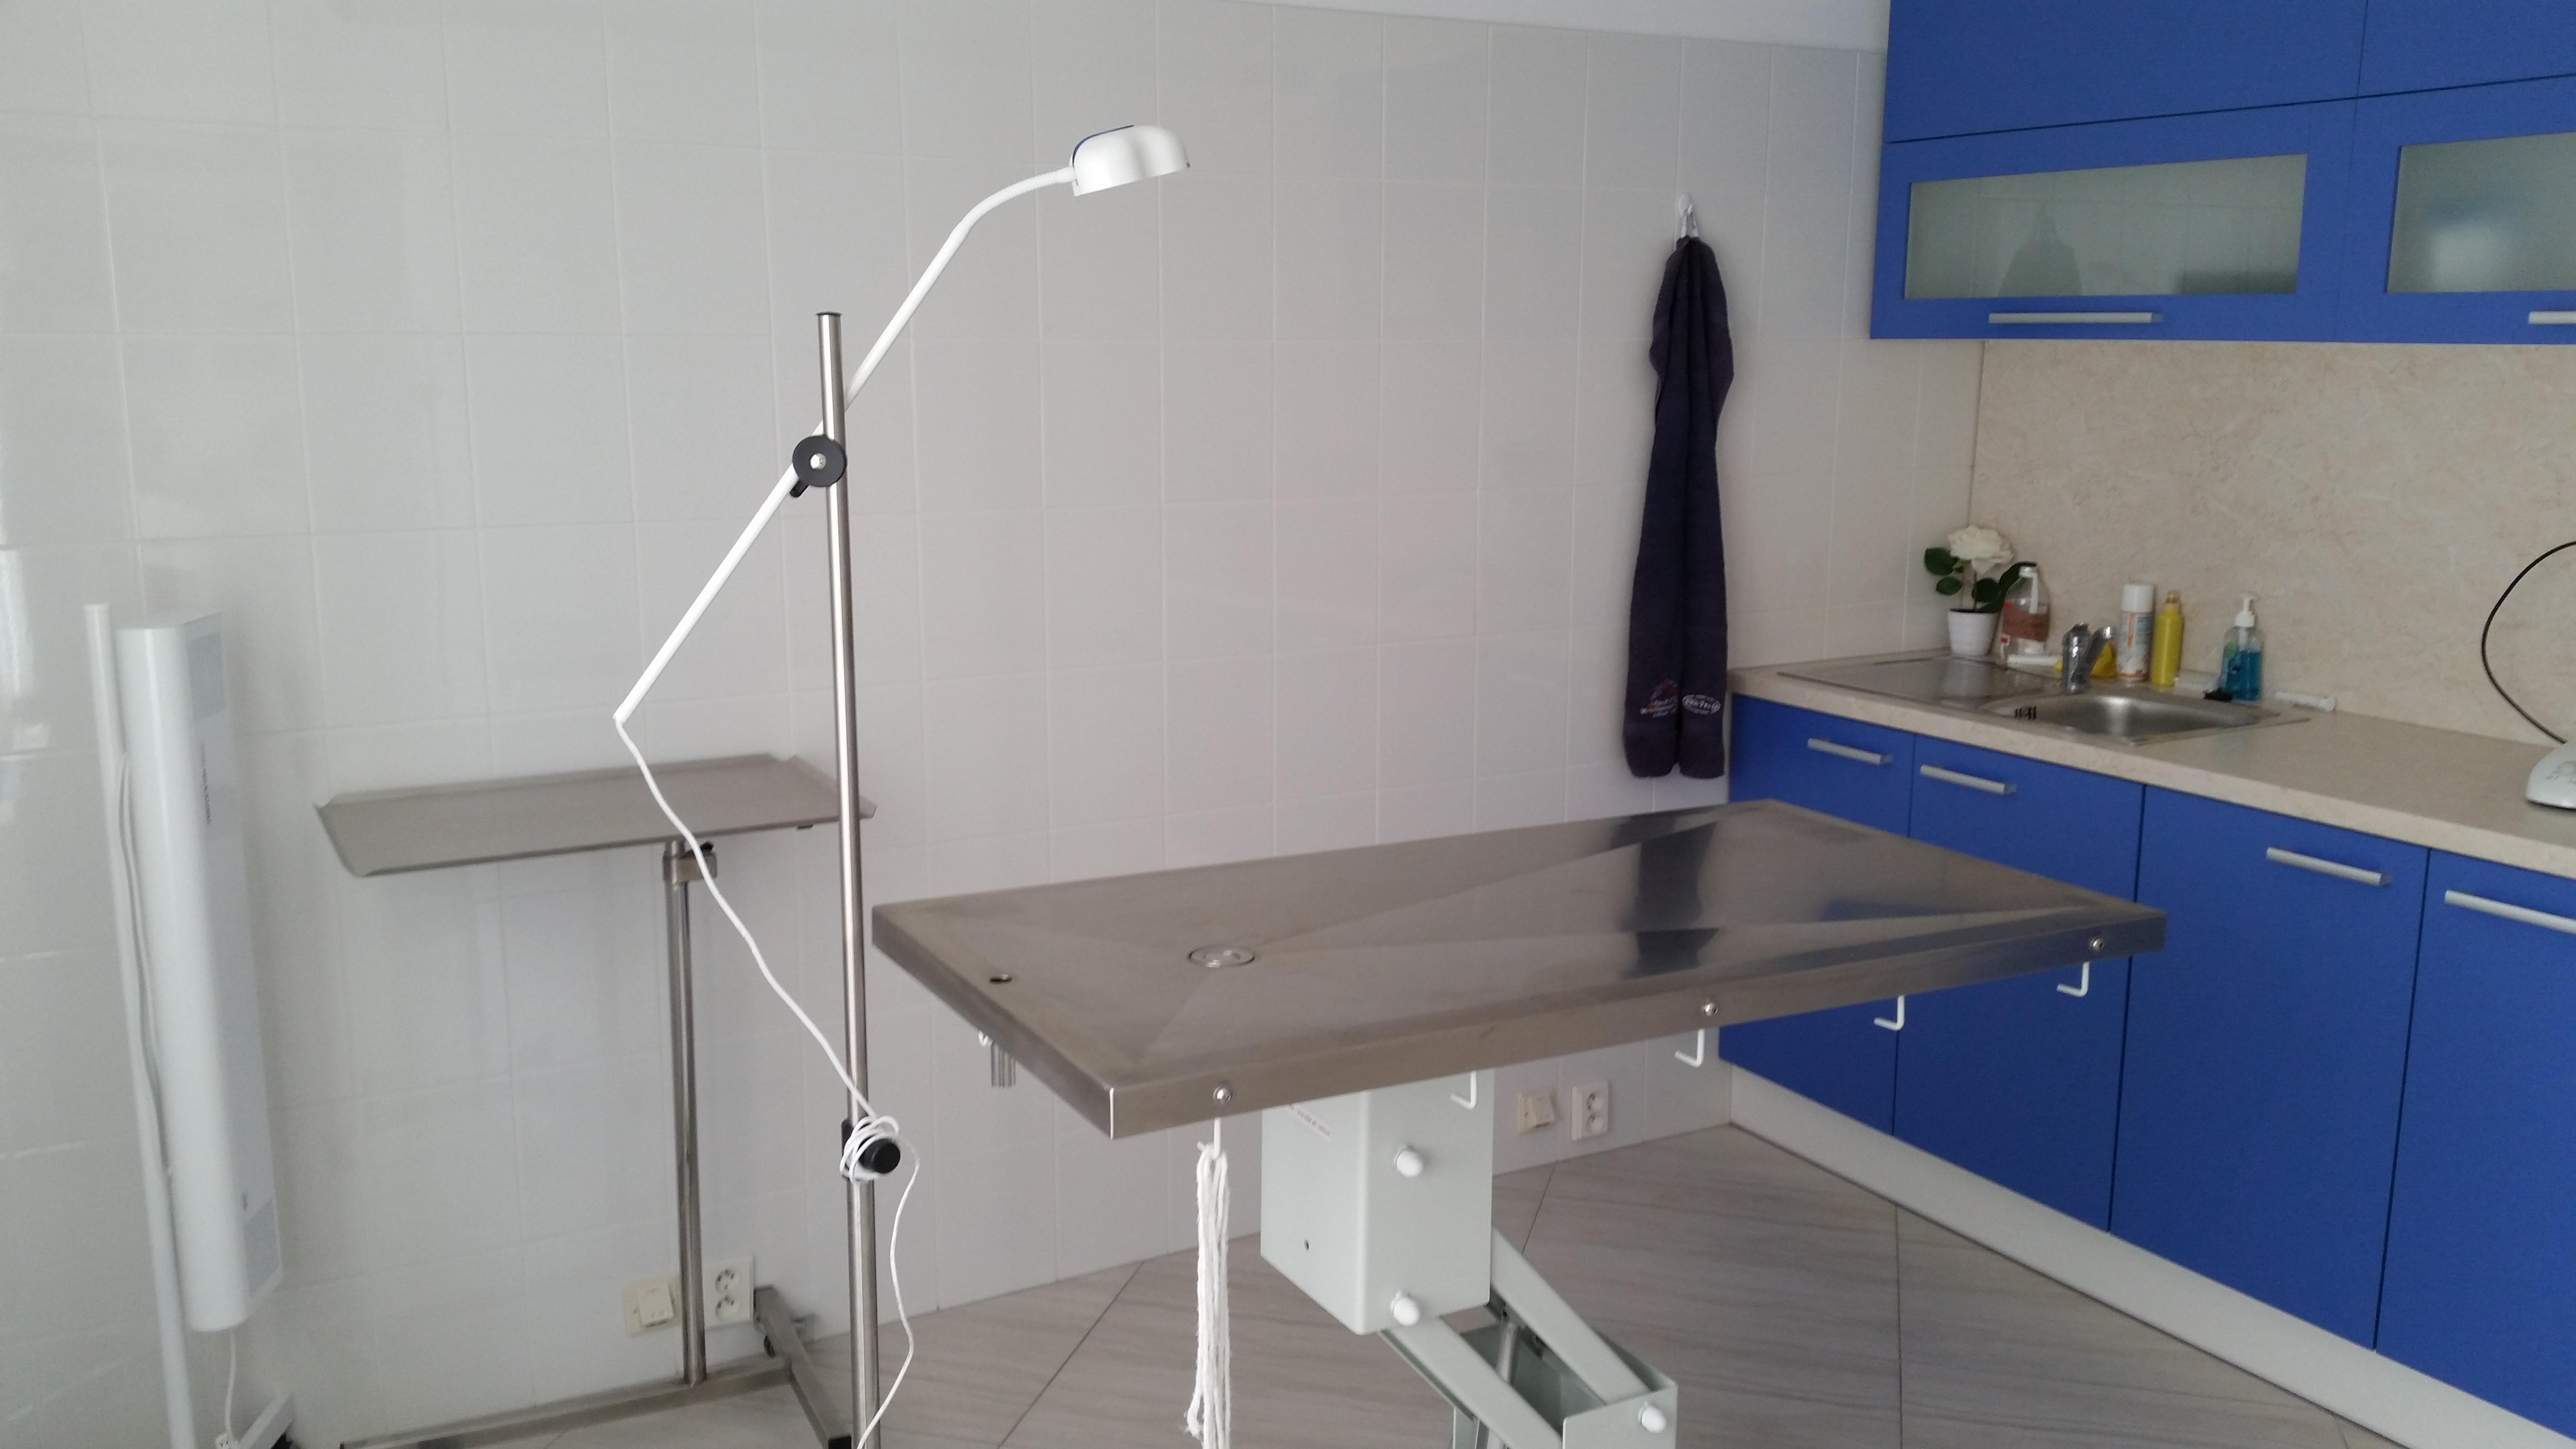 veterinarna ambulancia sigivet nitra